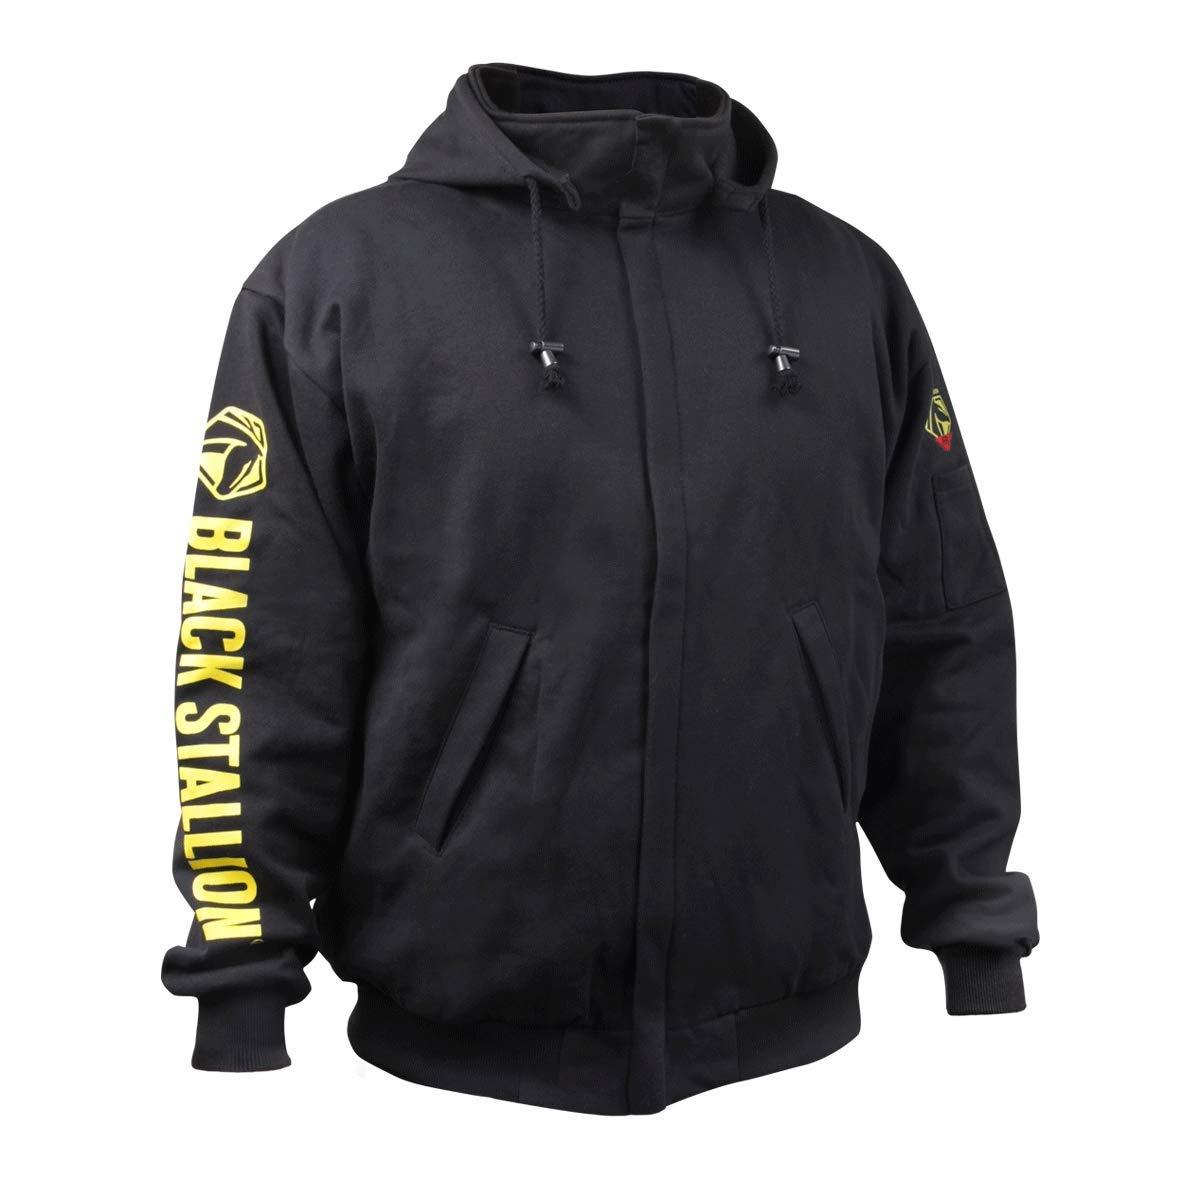 Revco/Black Stallion Truguard™ 200 Fr Cotton Black Hooded Sweatshirt Size-Med